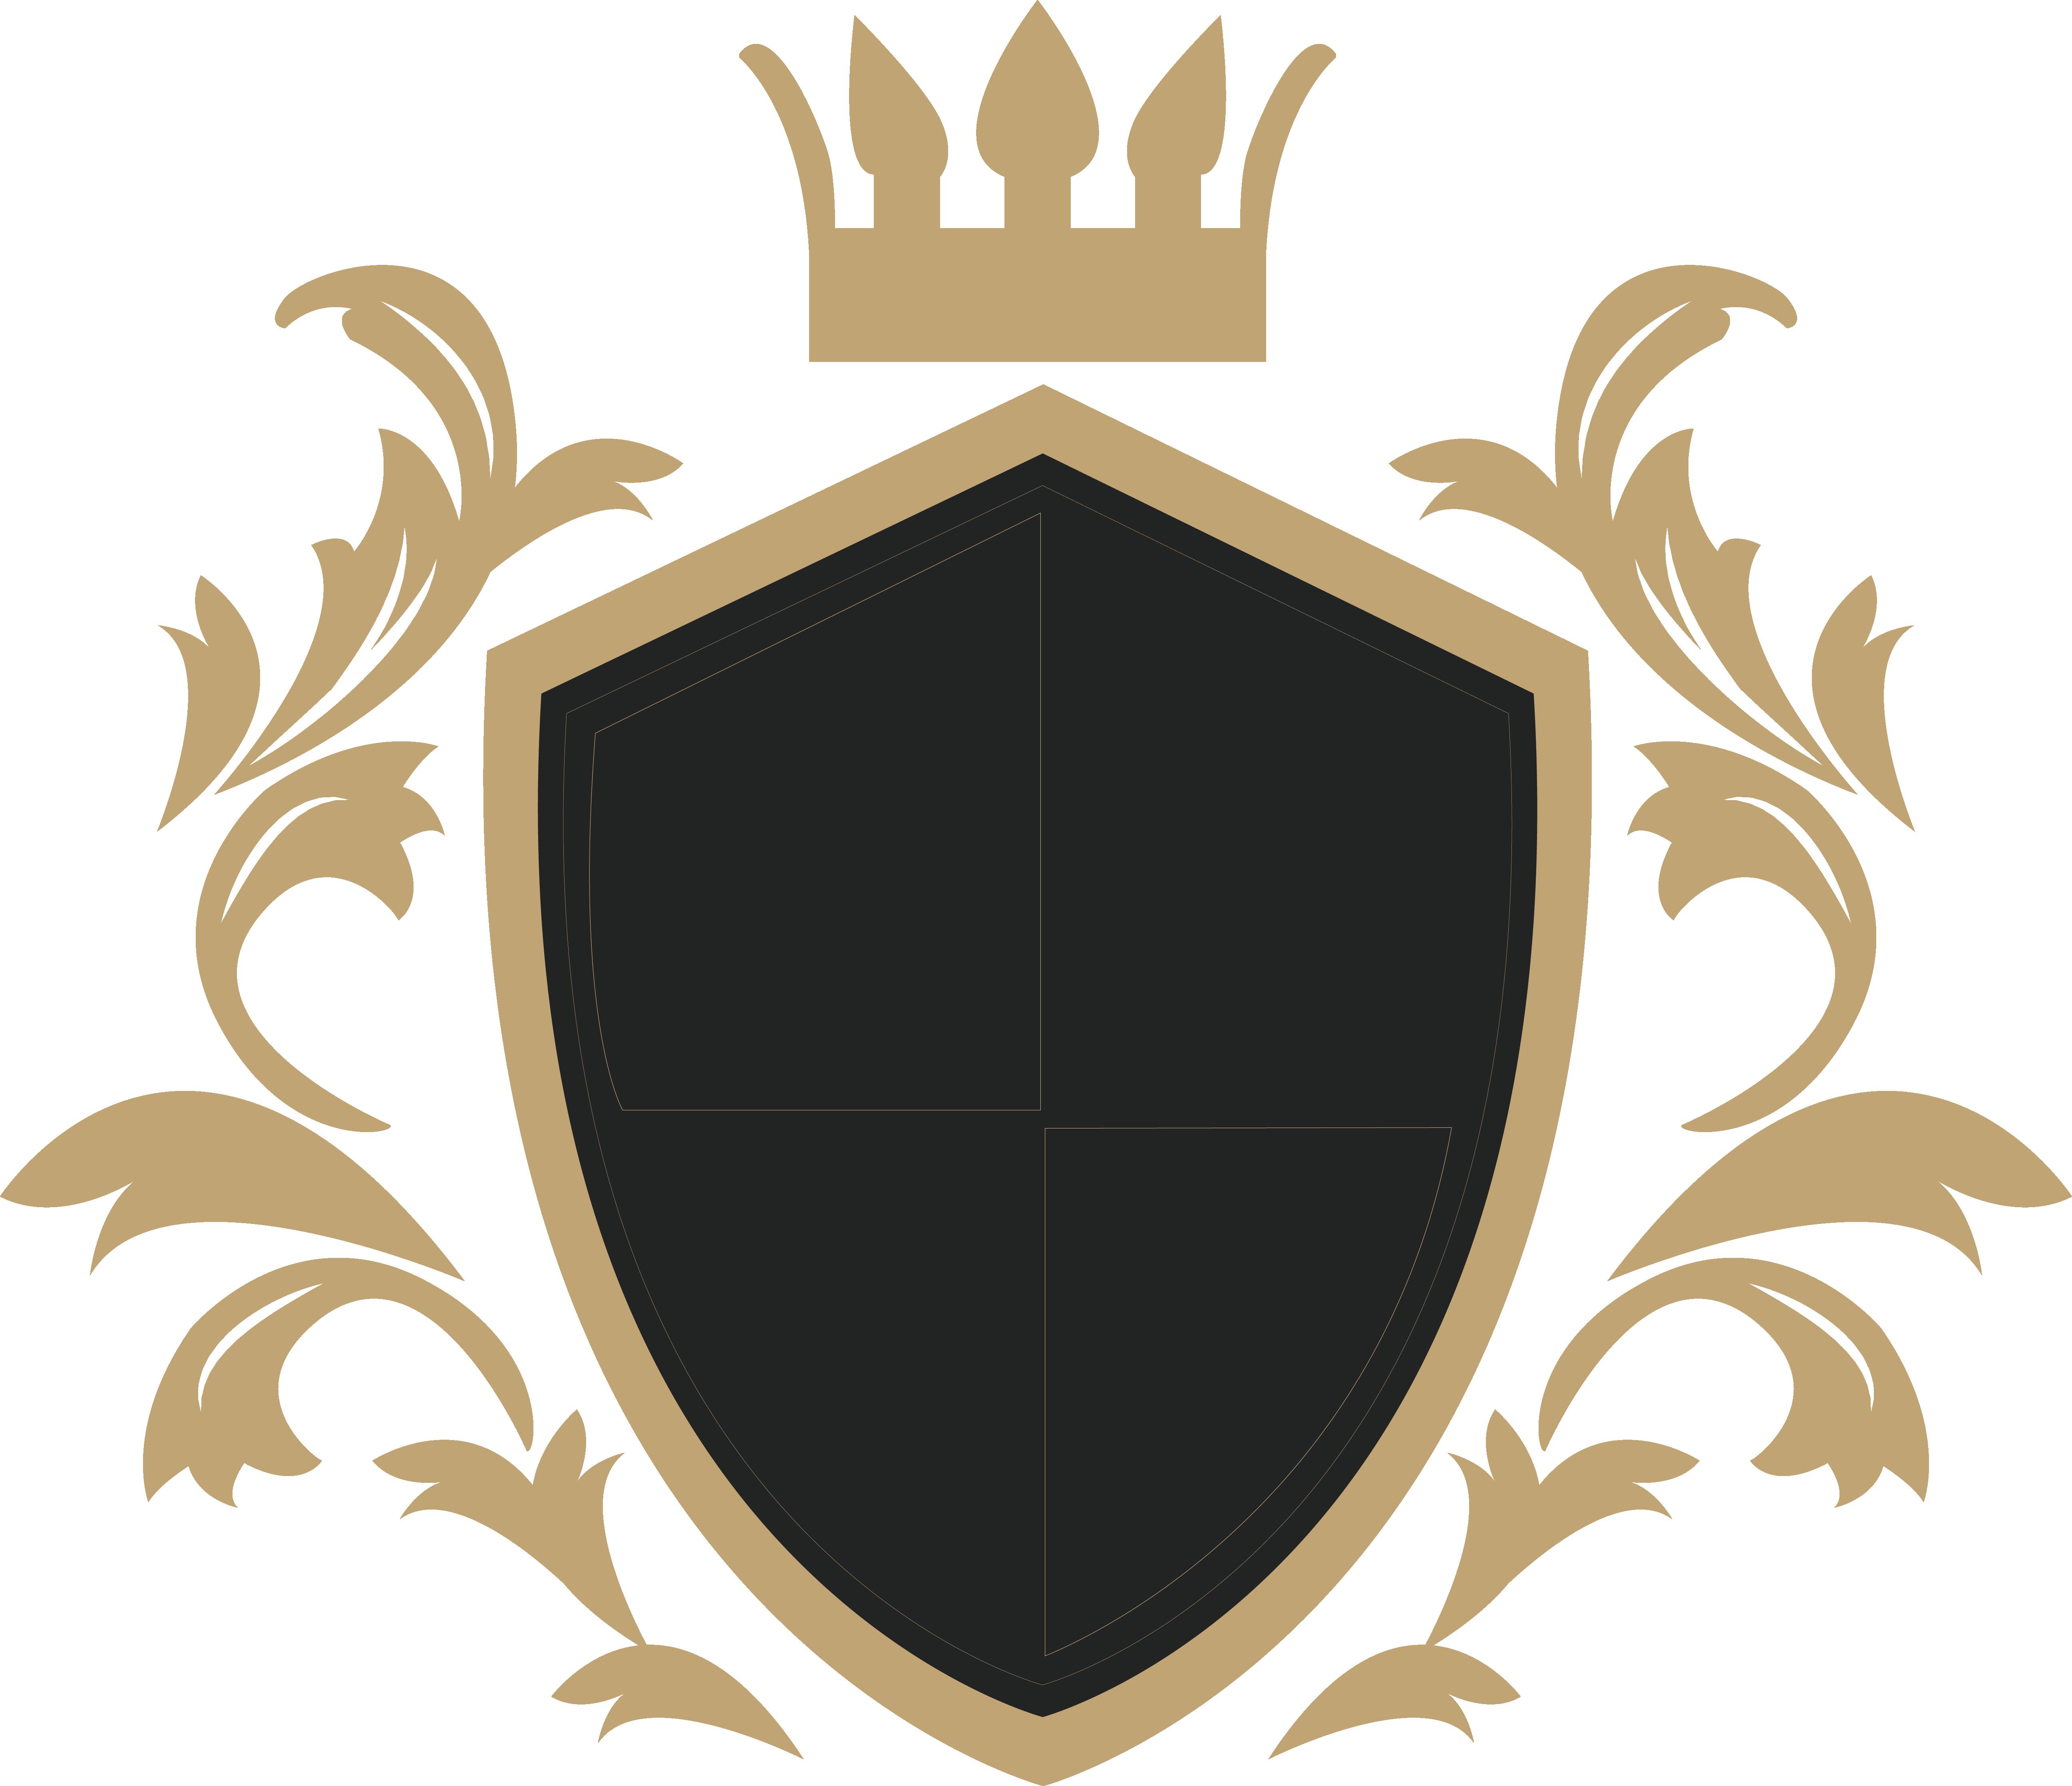 Shield Free PNG Image.